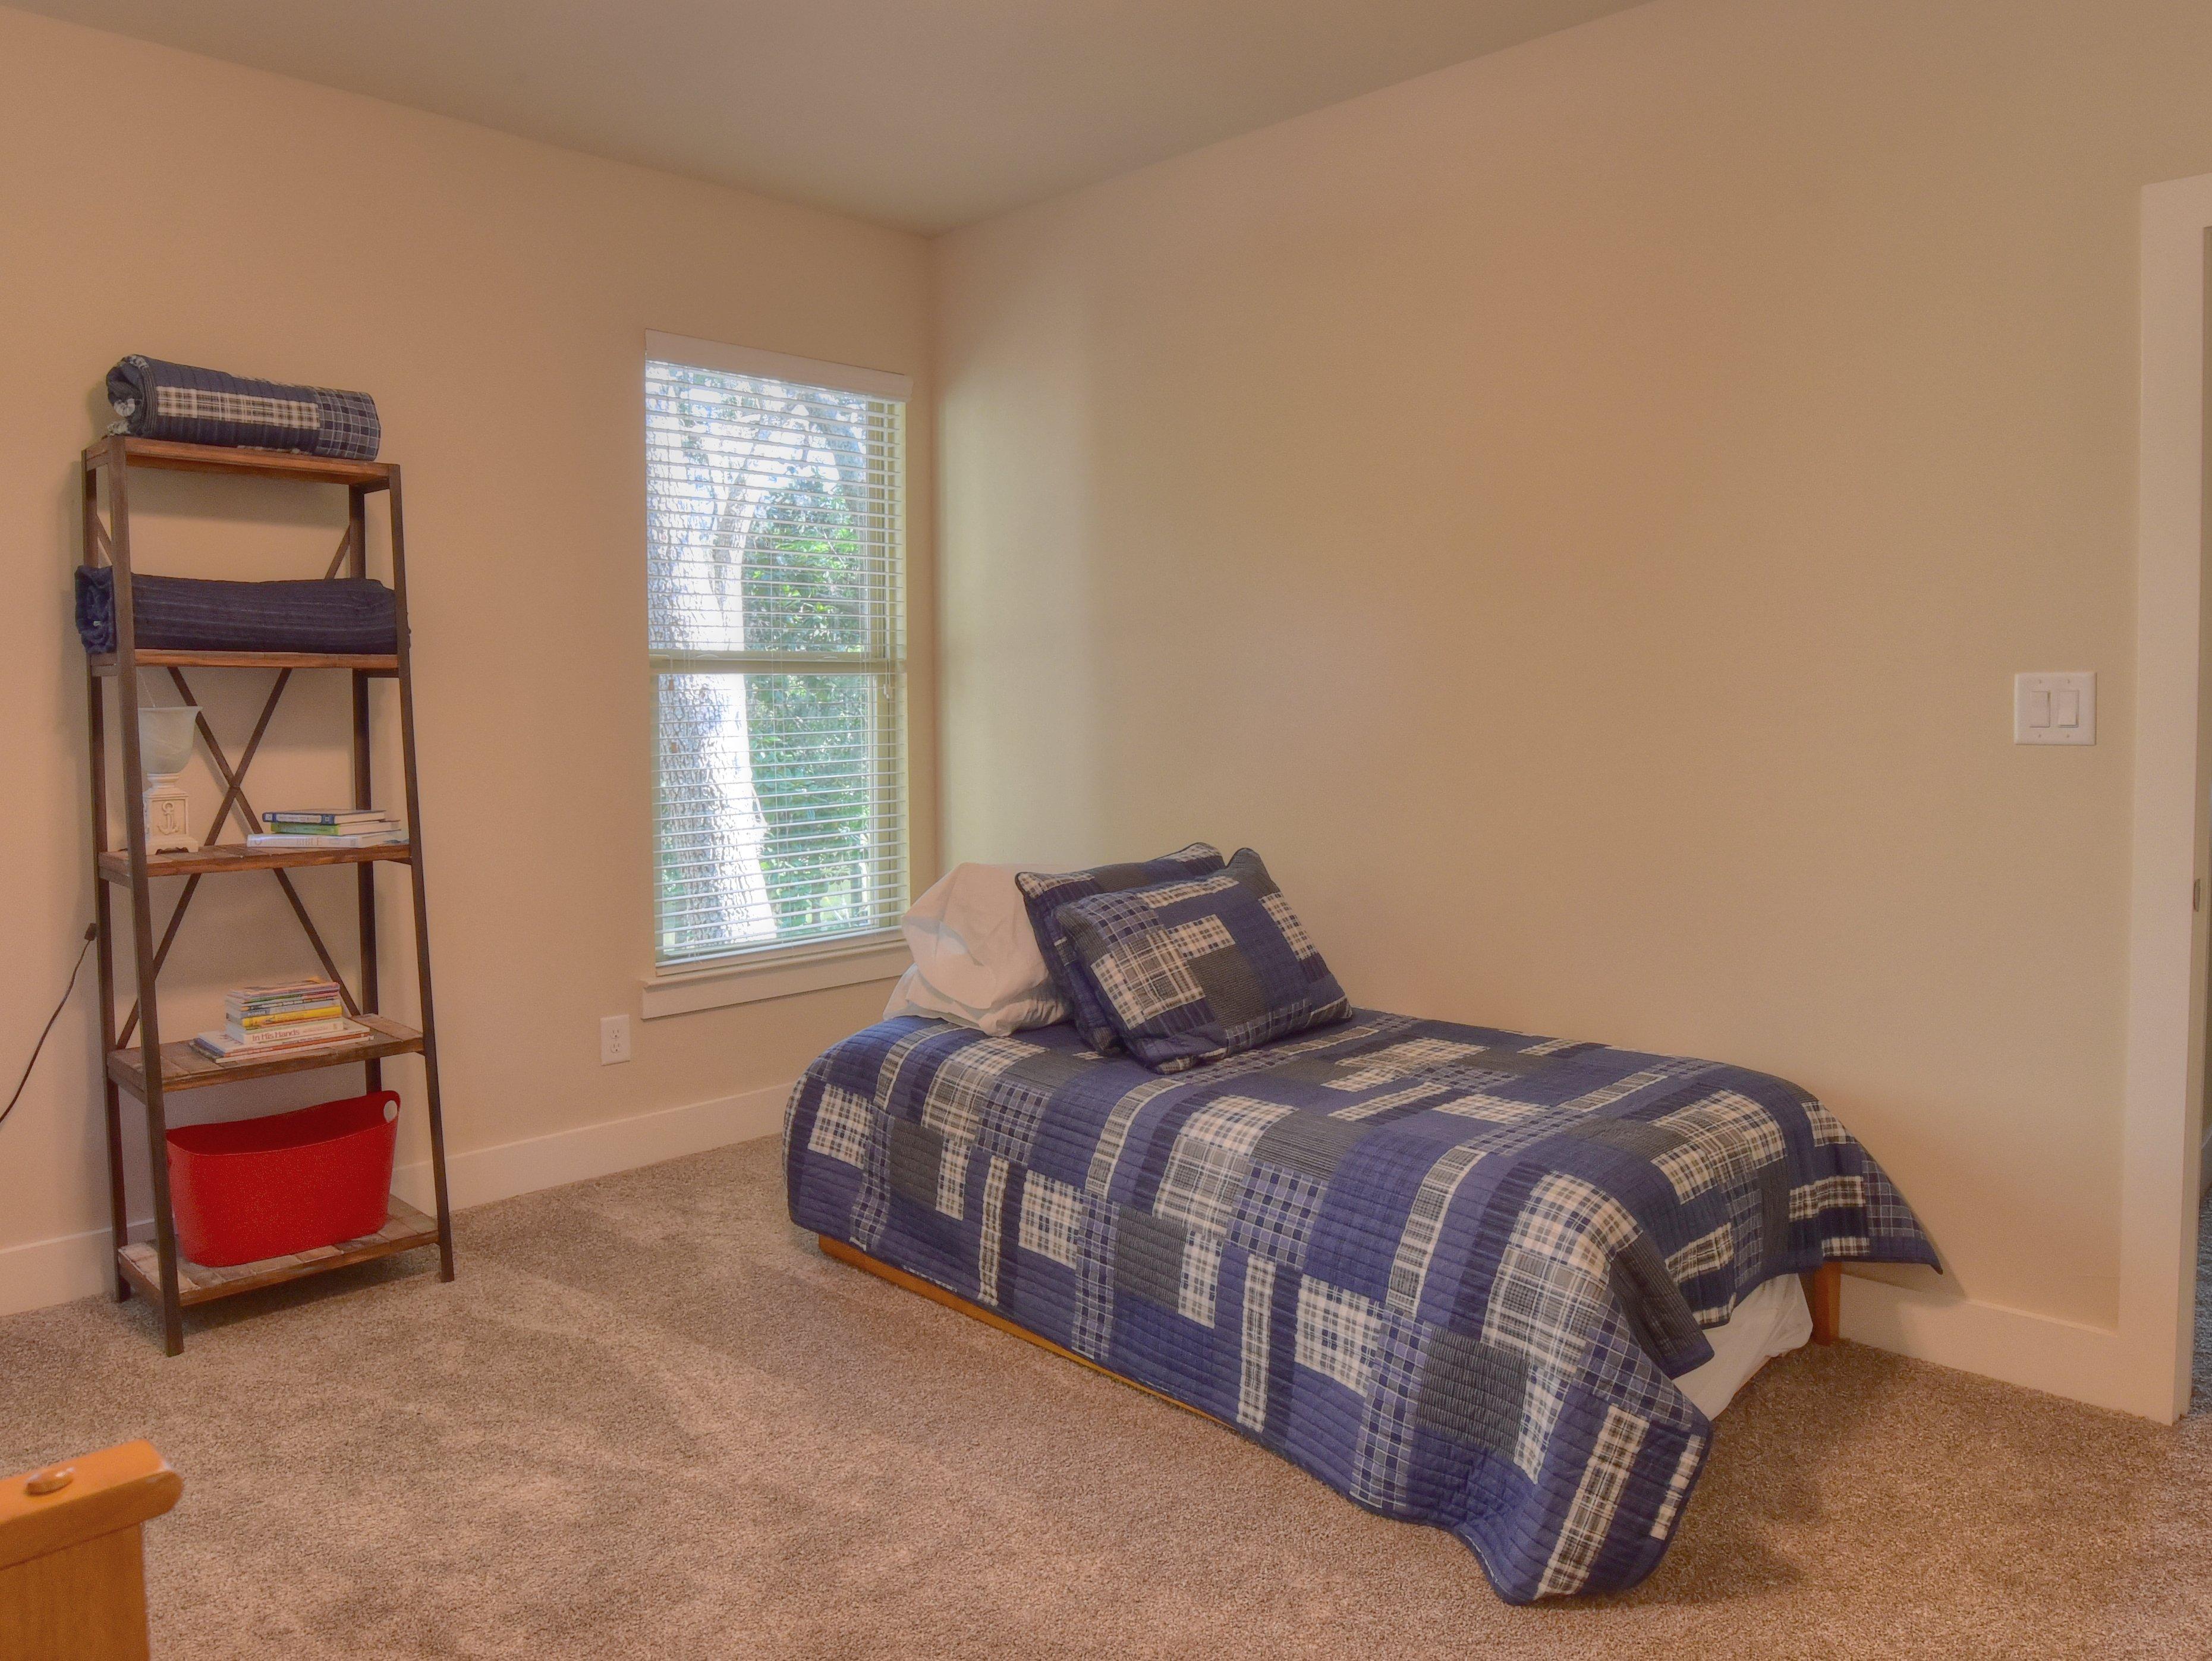 93 Beacon Point Condo rental in Sandestin Rentals ~ Cottages and Villas  in Destin Florida - #19